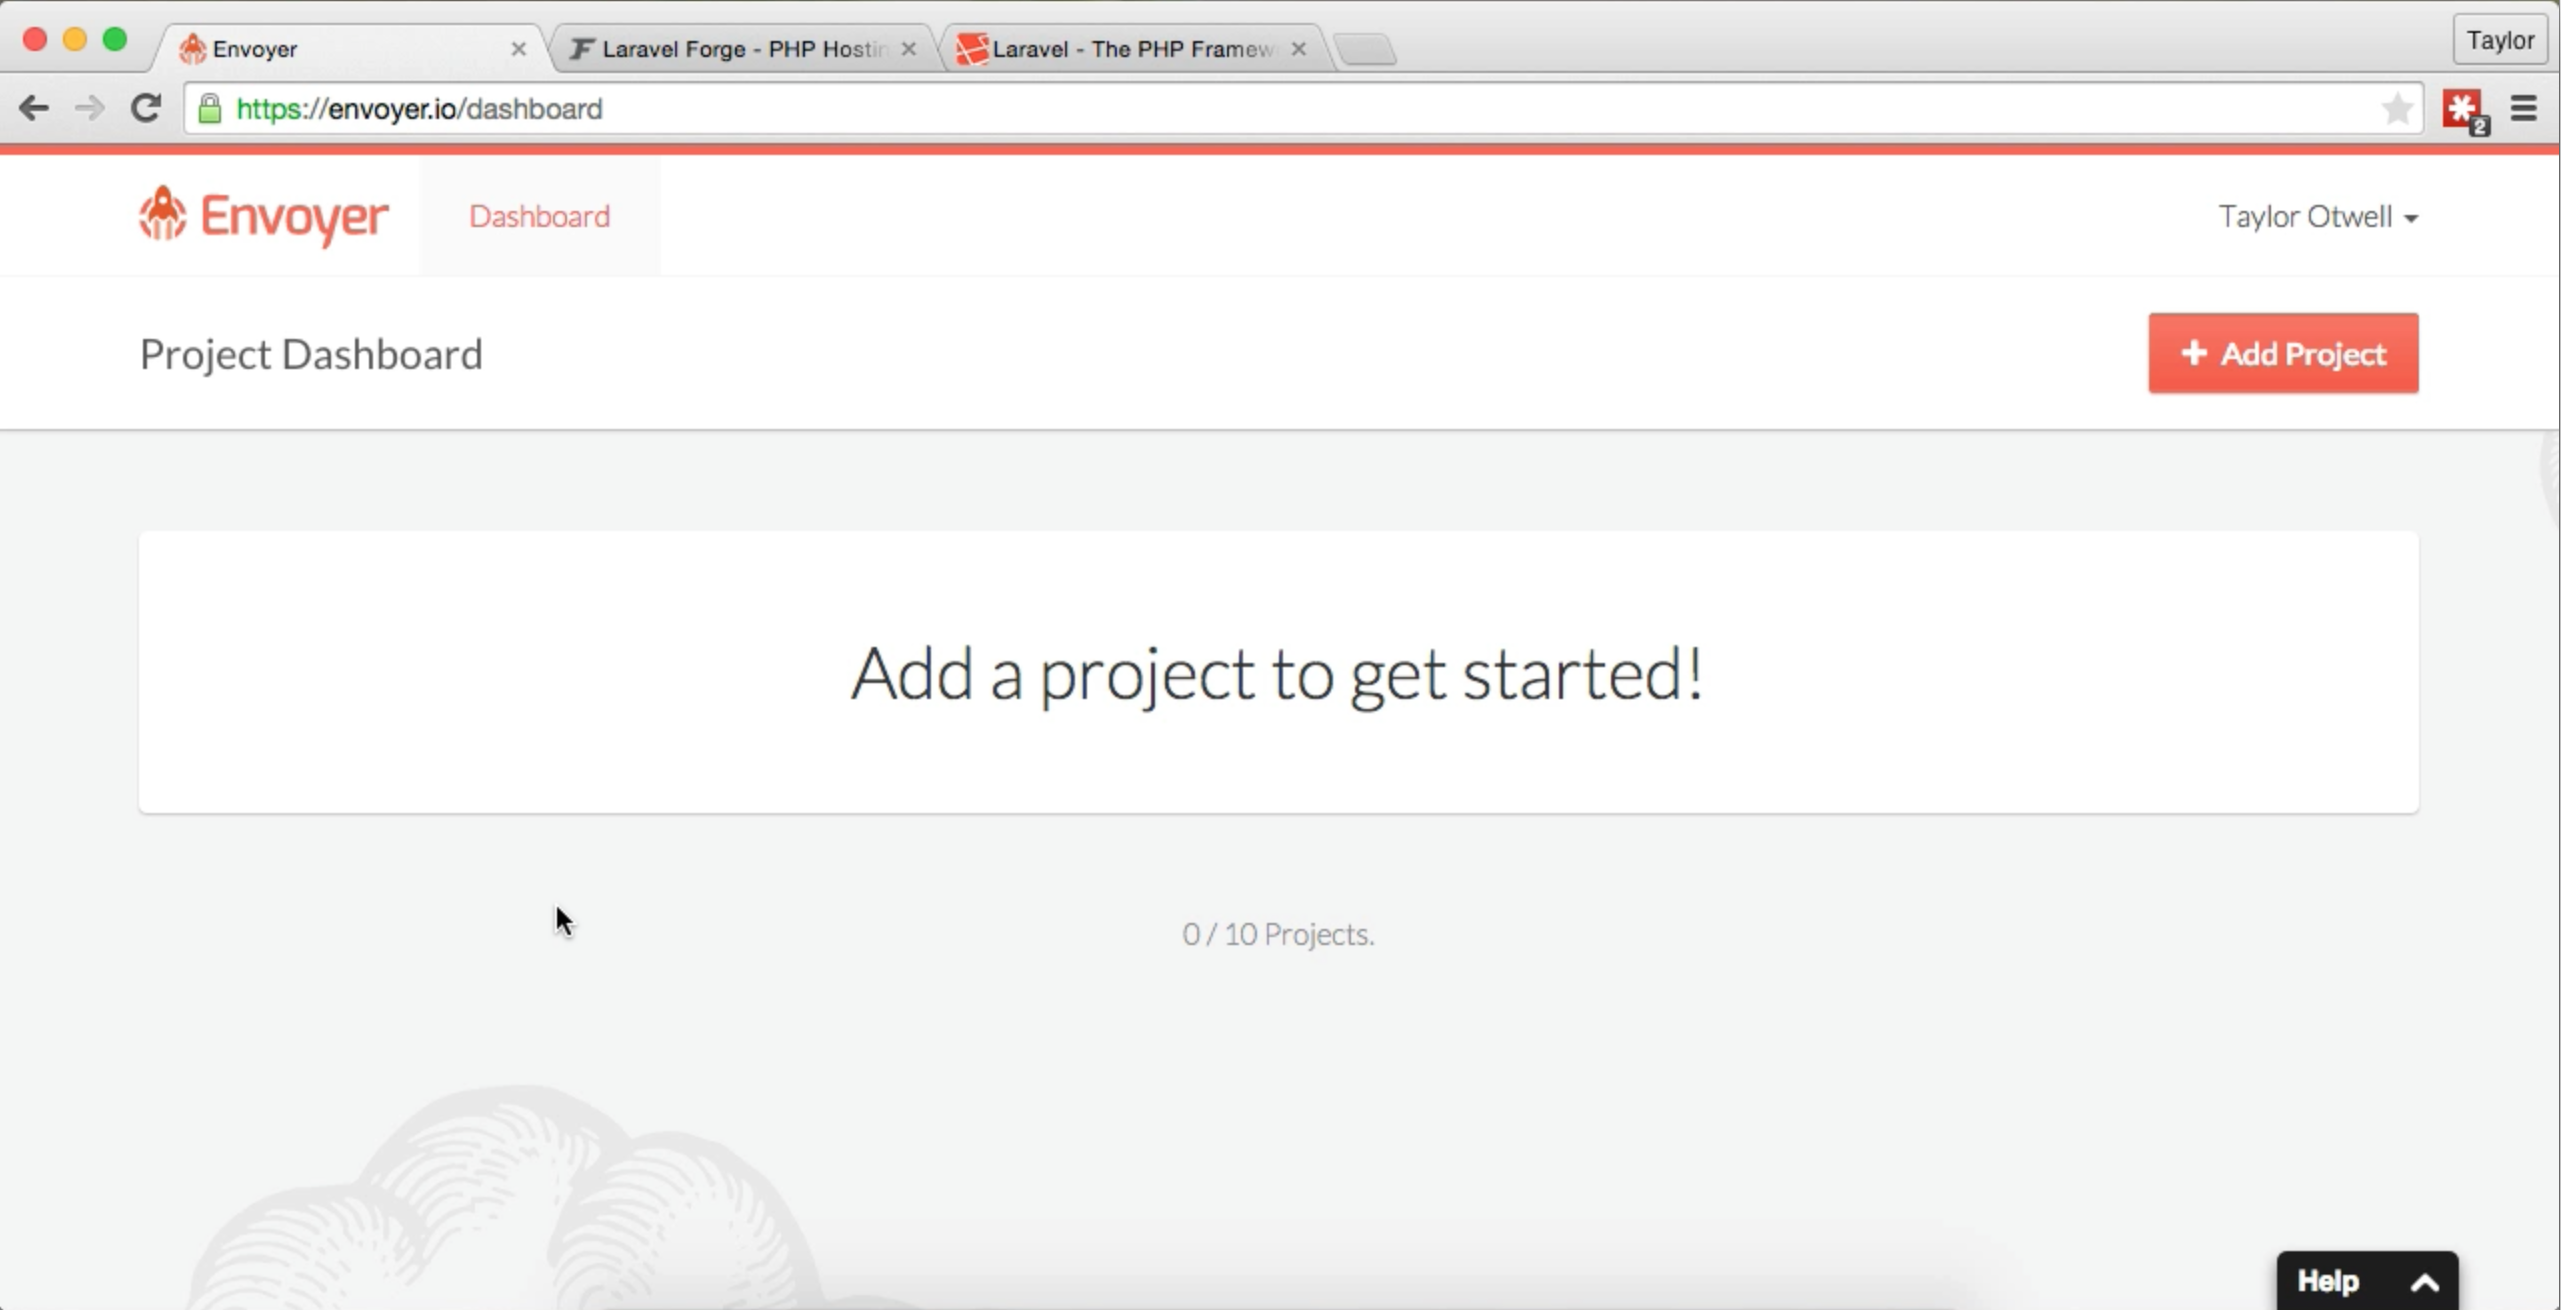 - envoyer screenshot 01 - Introducing Envoyer.io | MattStauffer.com